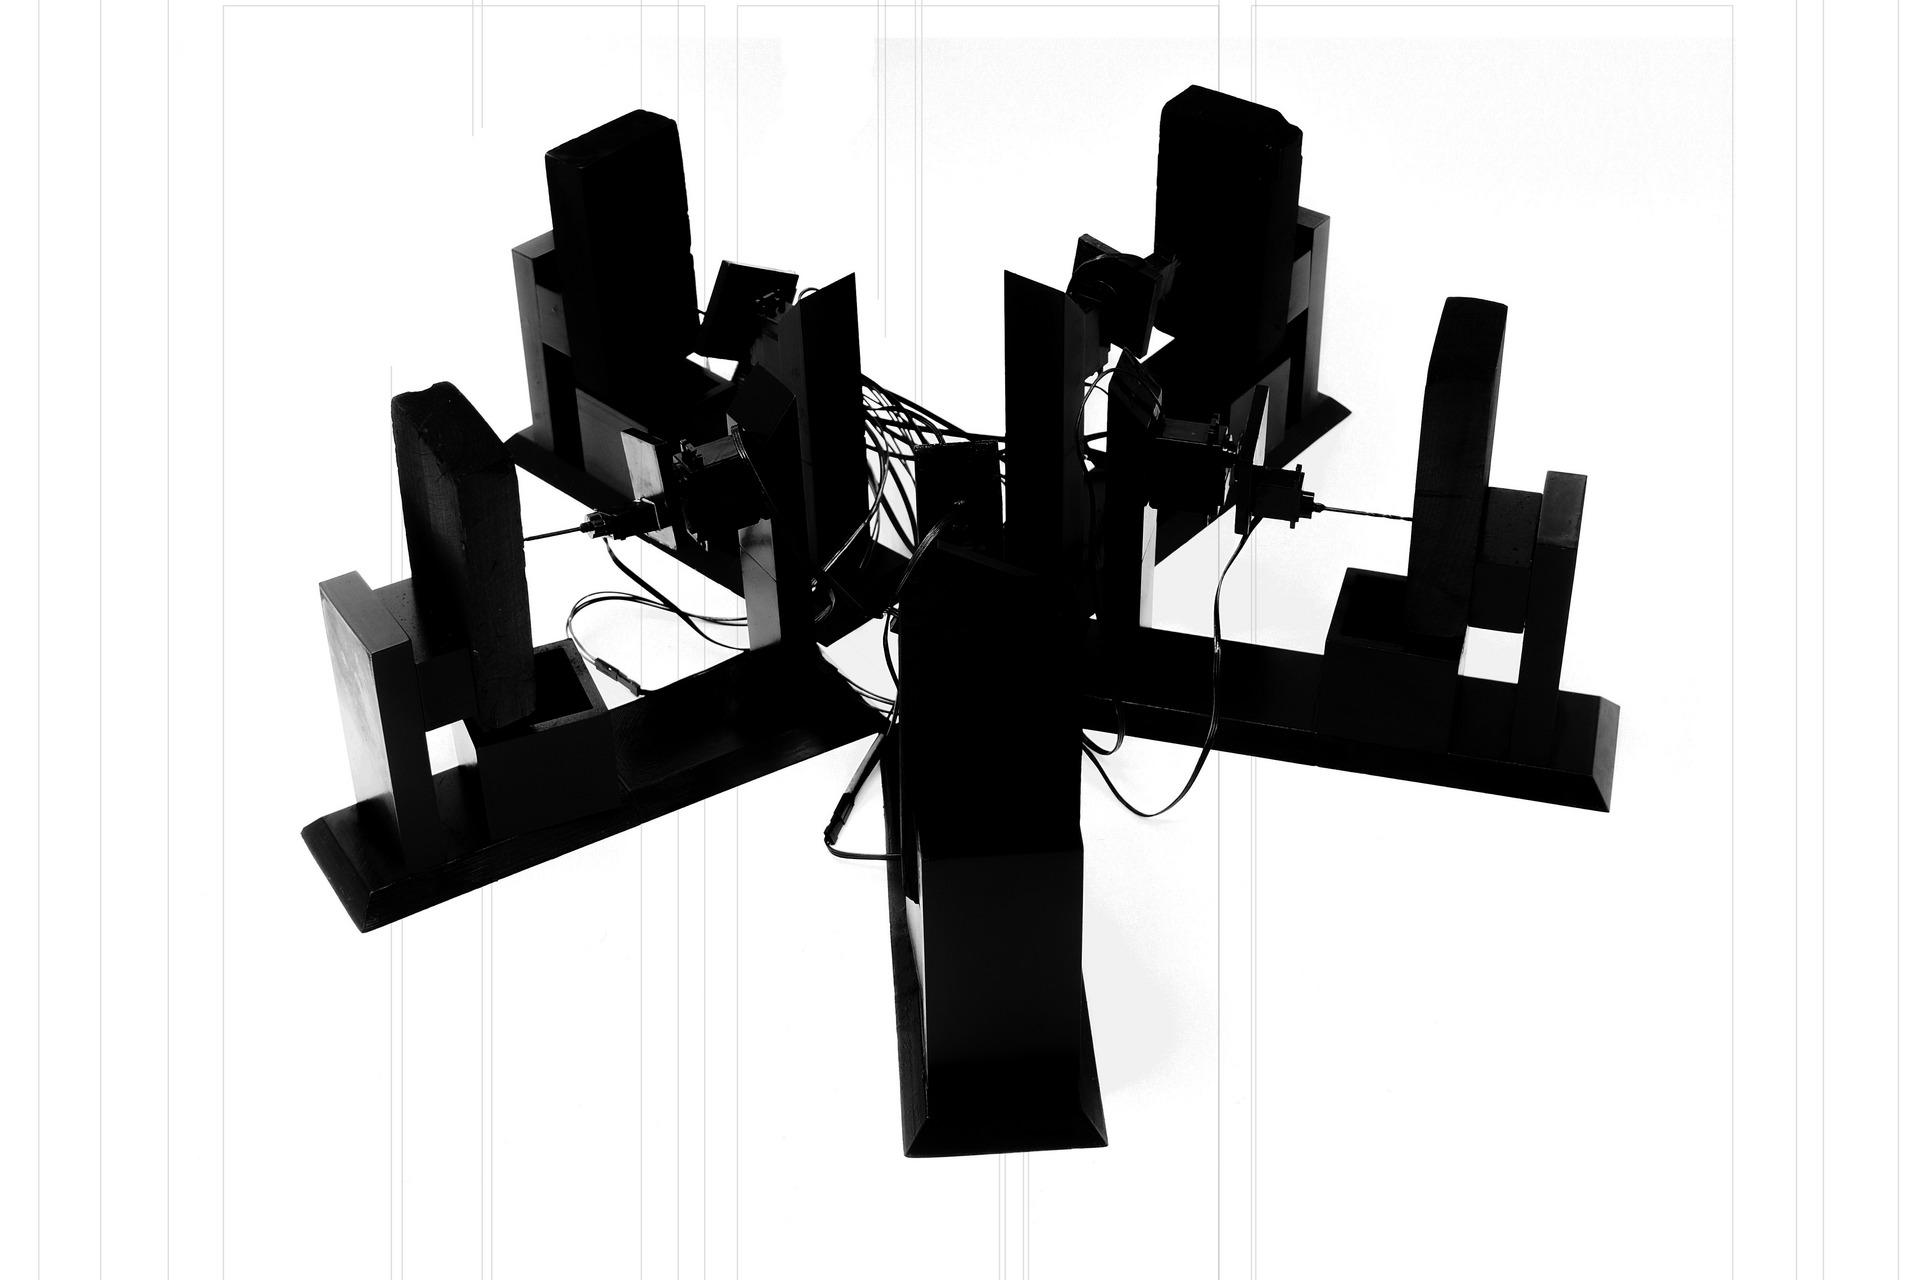 Robotic Shrines